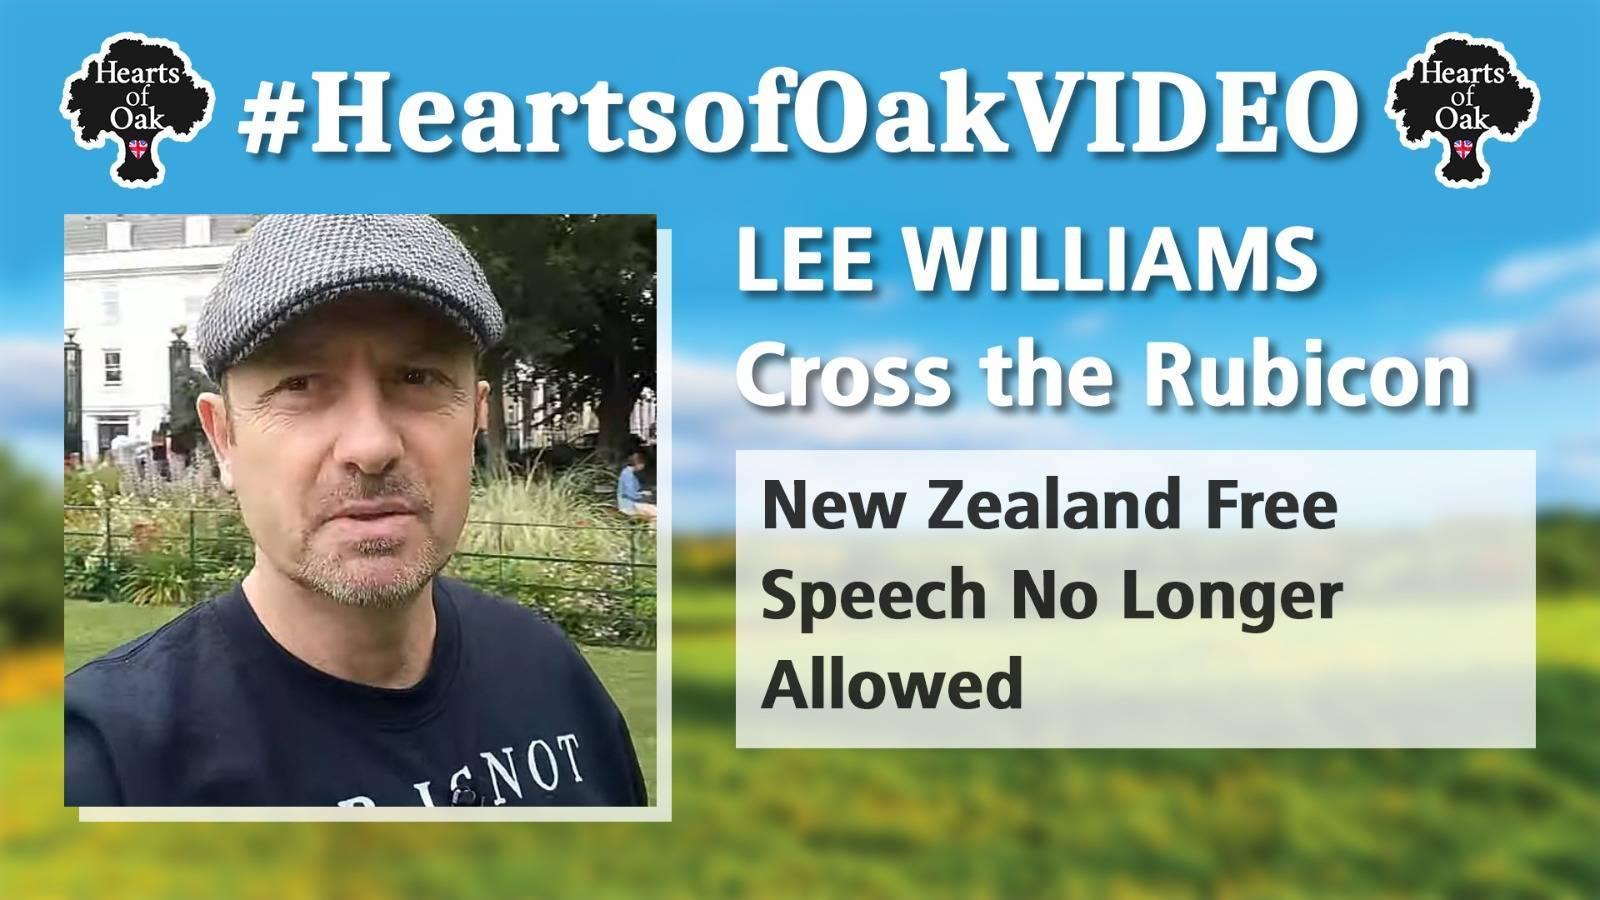 Lee Williams: Cross the Rubicon: New Zealand Free Speech No Longer Allowed